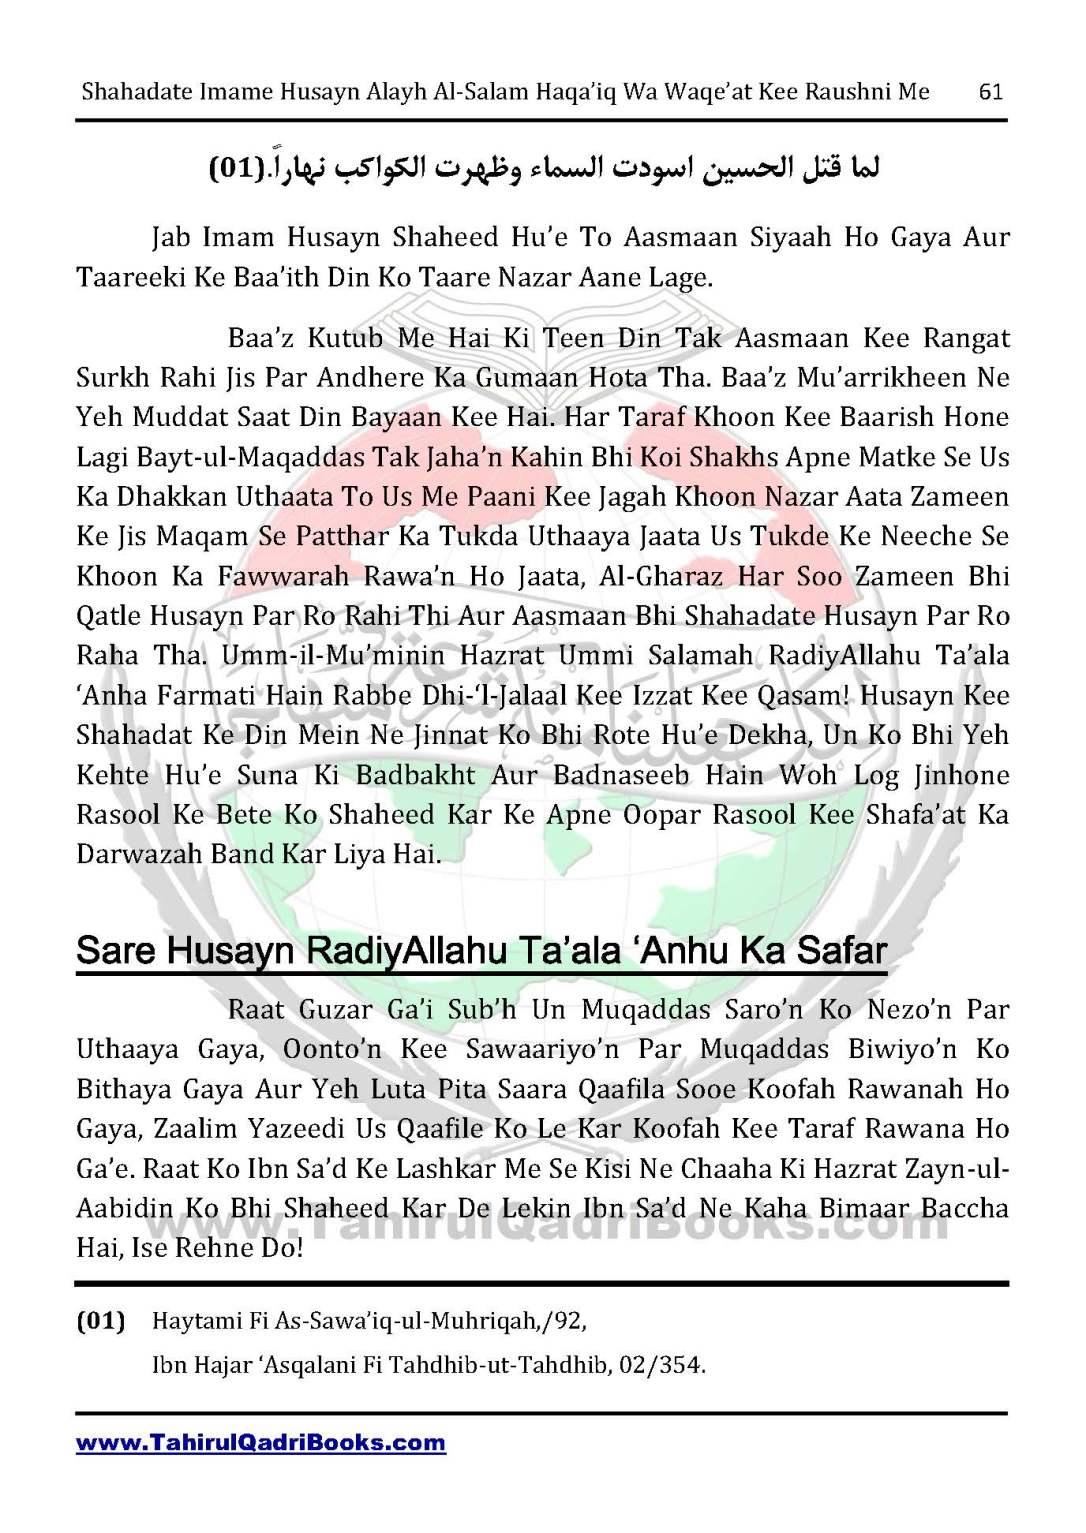 shahadate-imame-husayn-alayh-is-salam-haqaiq-wa-waqe_at-kee-raushni-me-in-roman-urdu-unlocked_Page_61